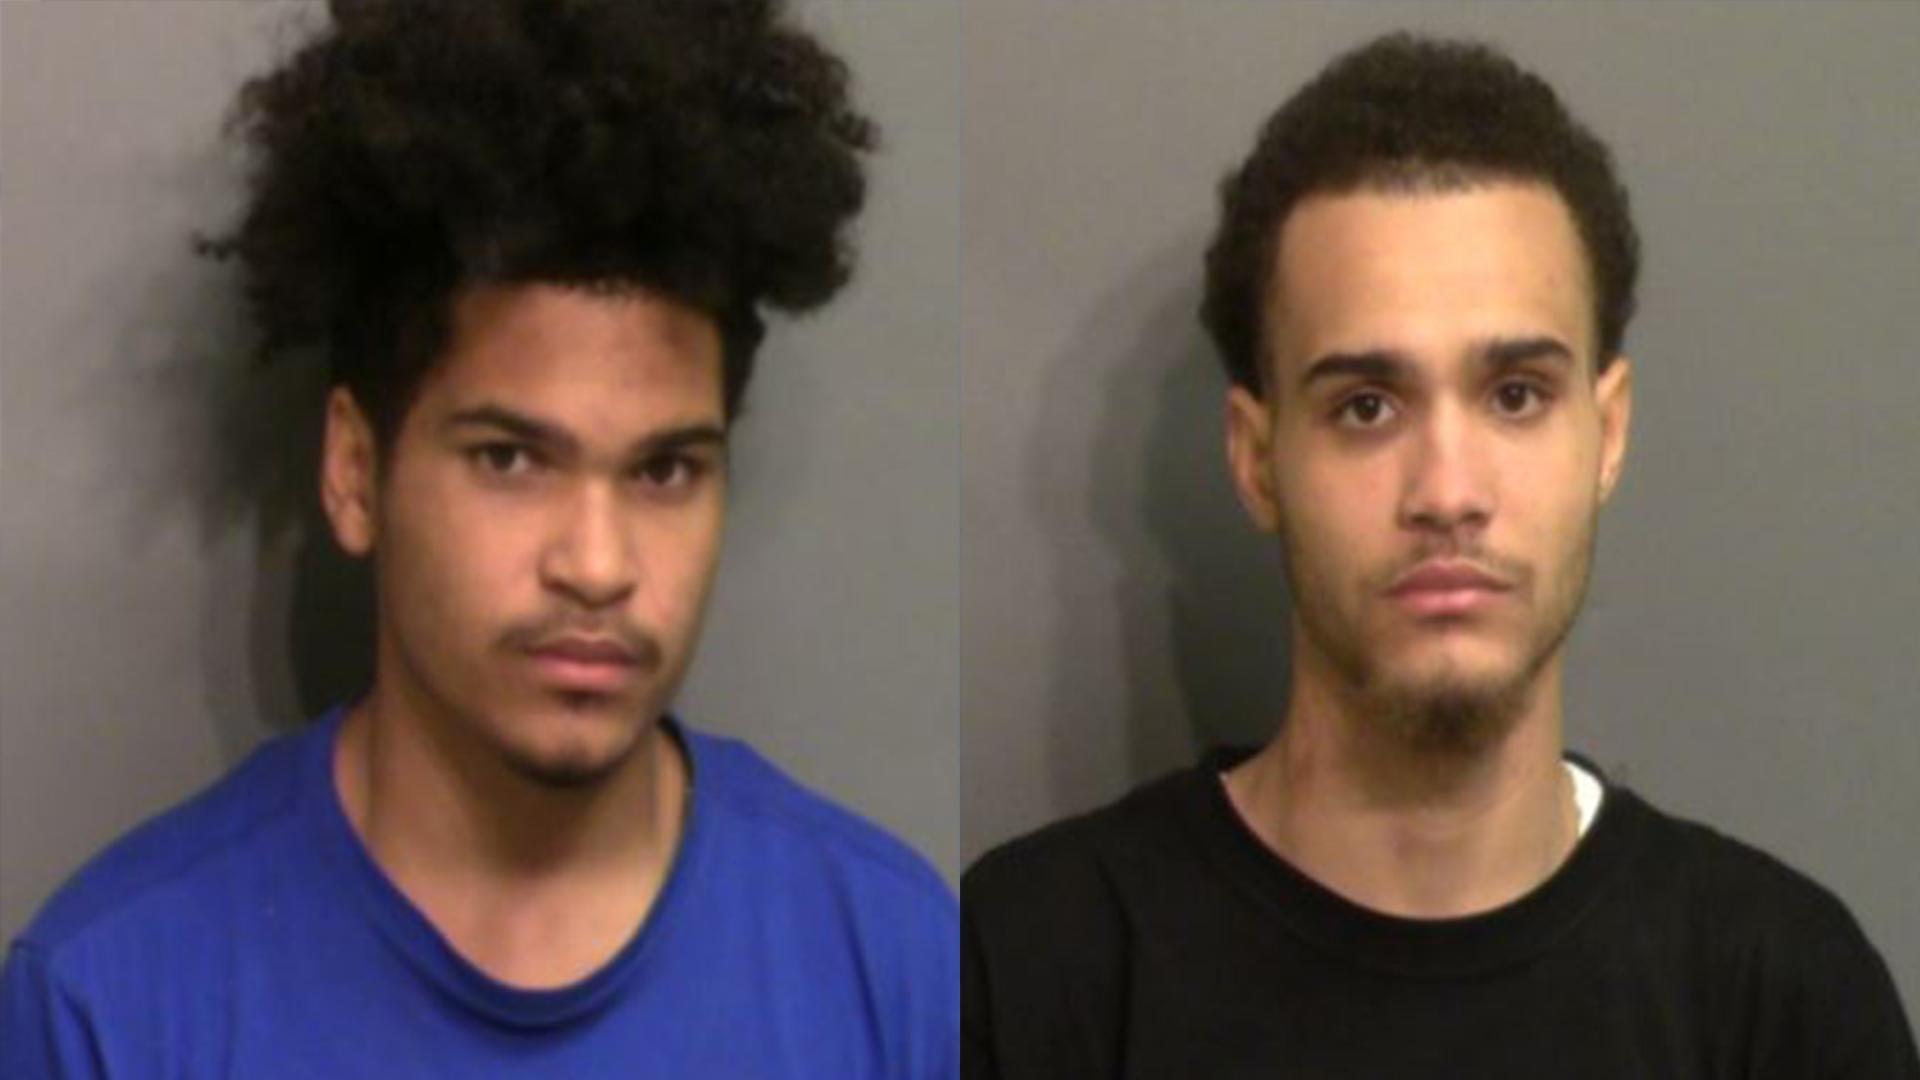 UPDATE: 2 Glynn County teens arrested in man's murder | WSAV-TV